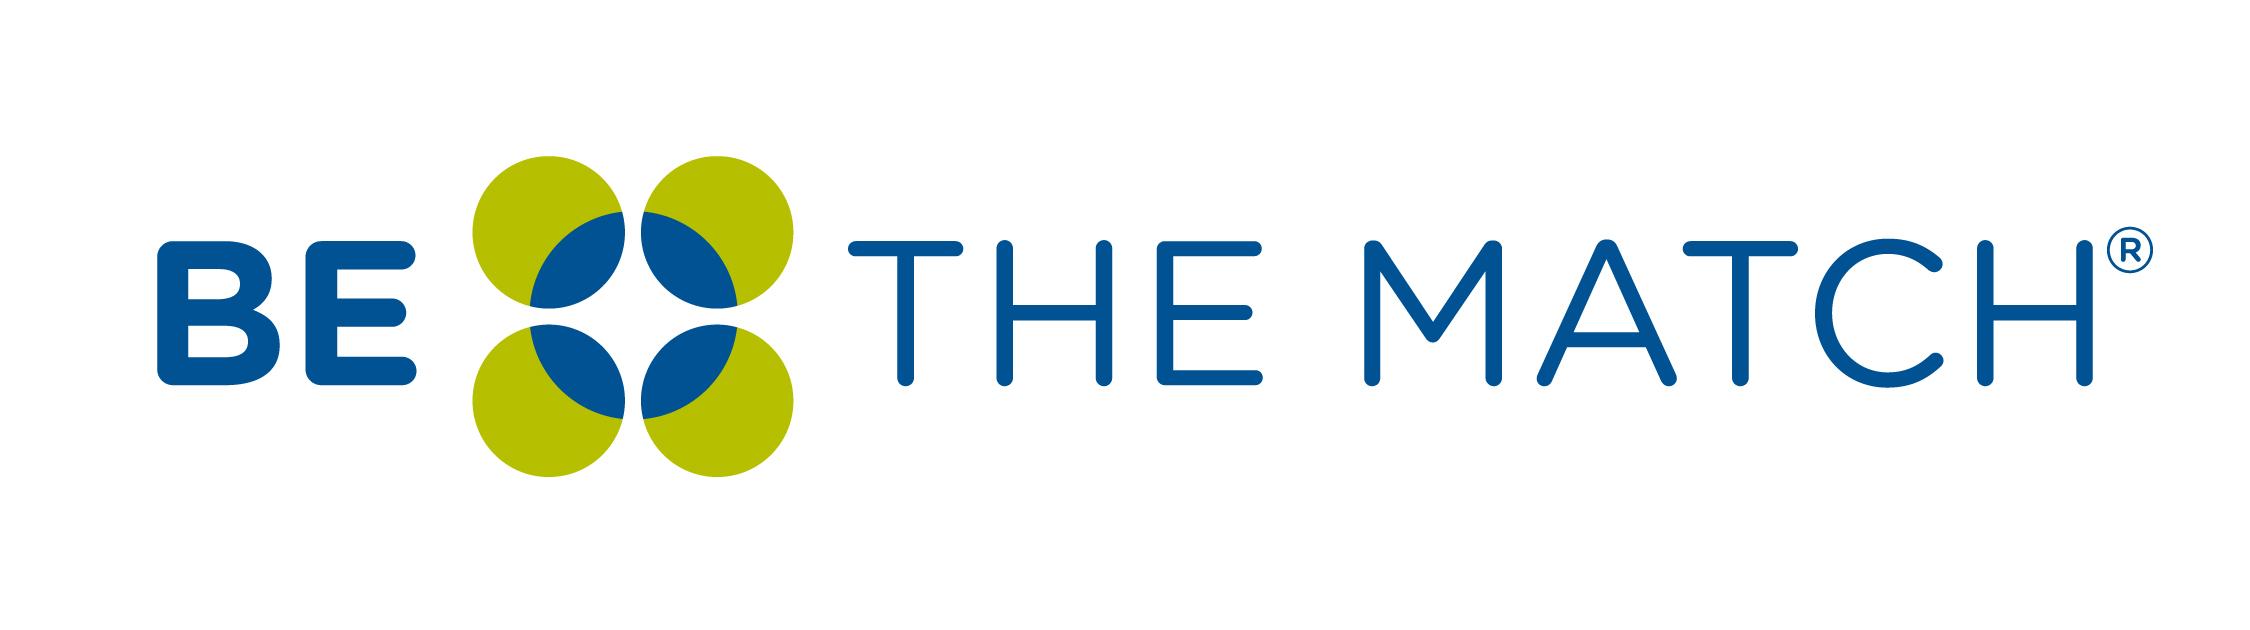 Be-the-Match-logo.jpg